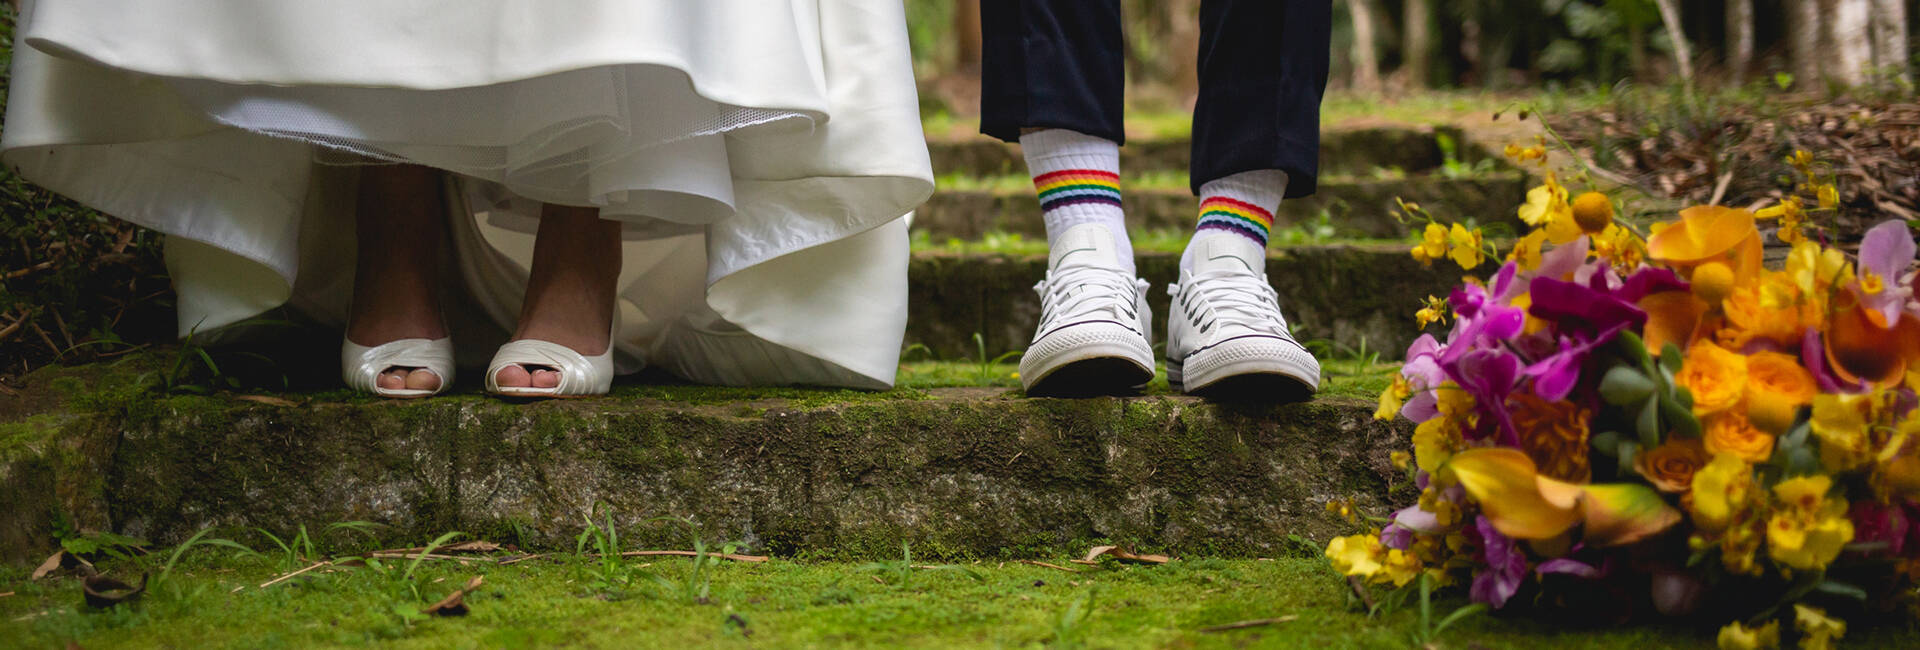 Casamento de Juliana + Fabiano